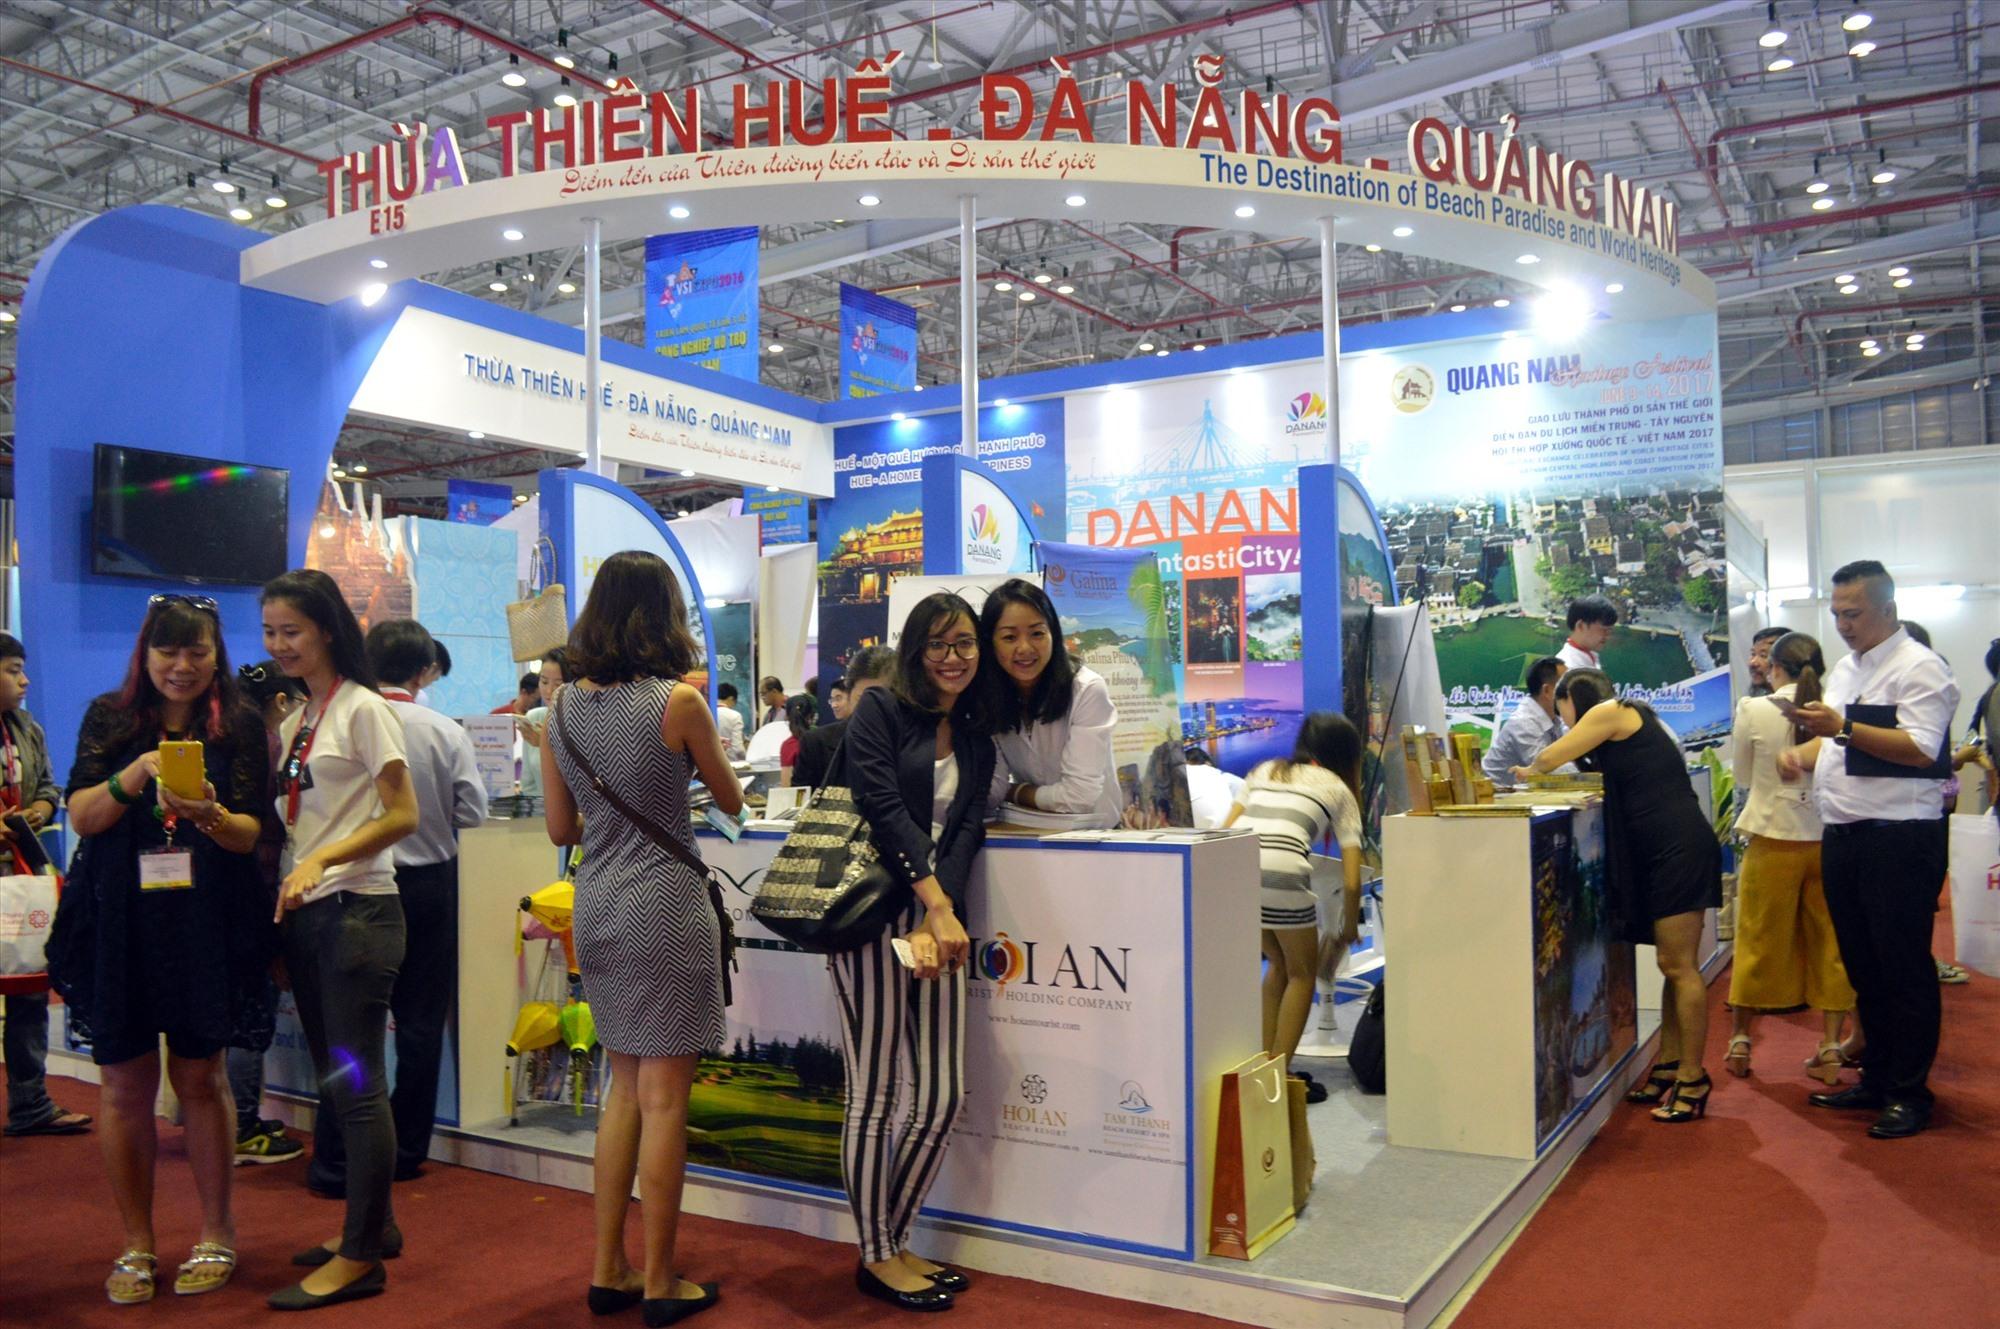 Quang Nam- Da Nang- Thua Thien Hue tourism promotion